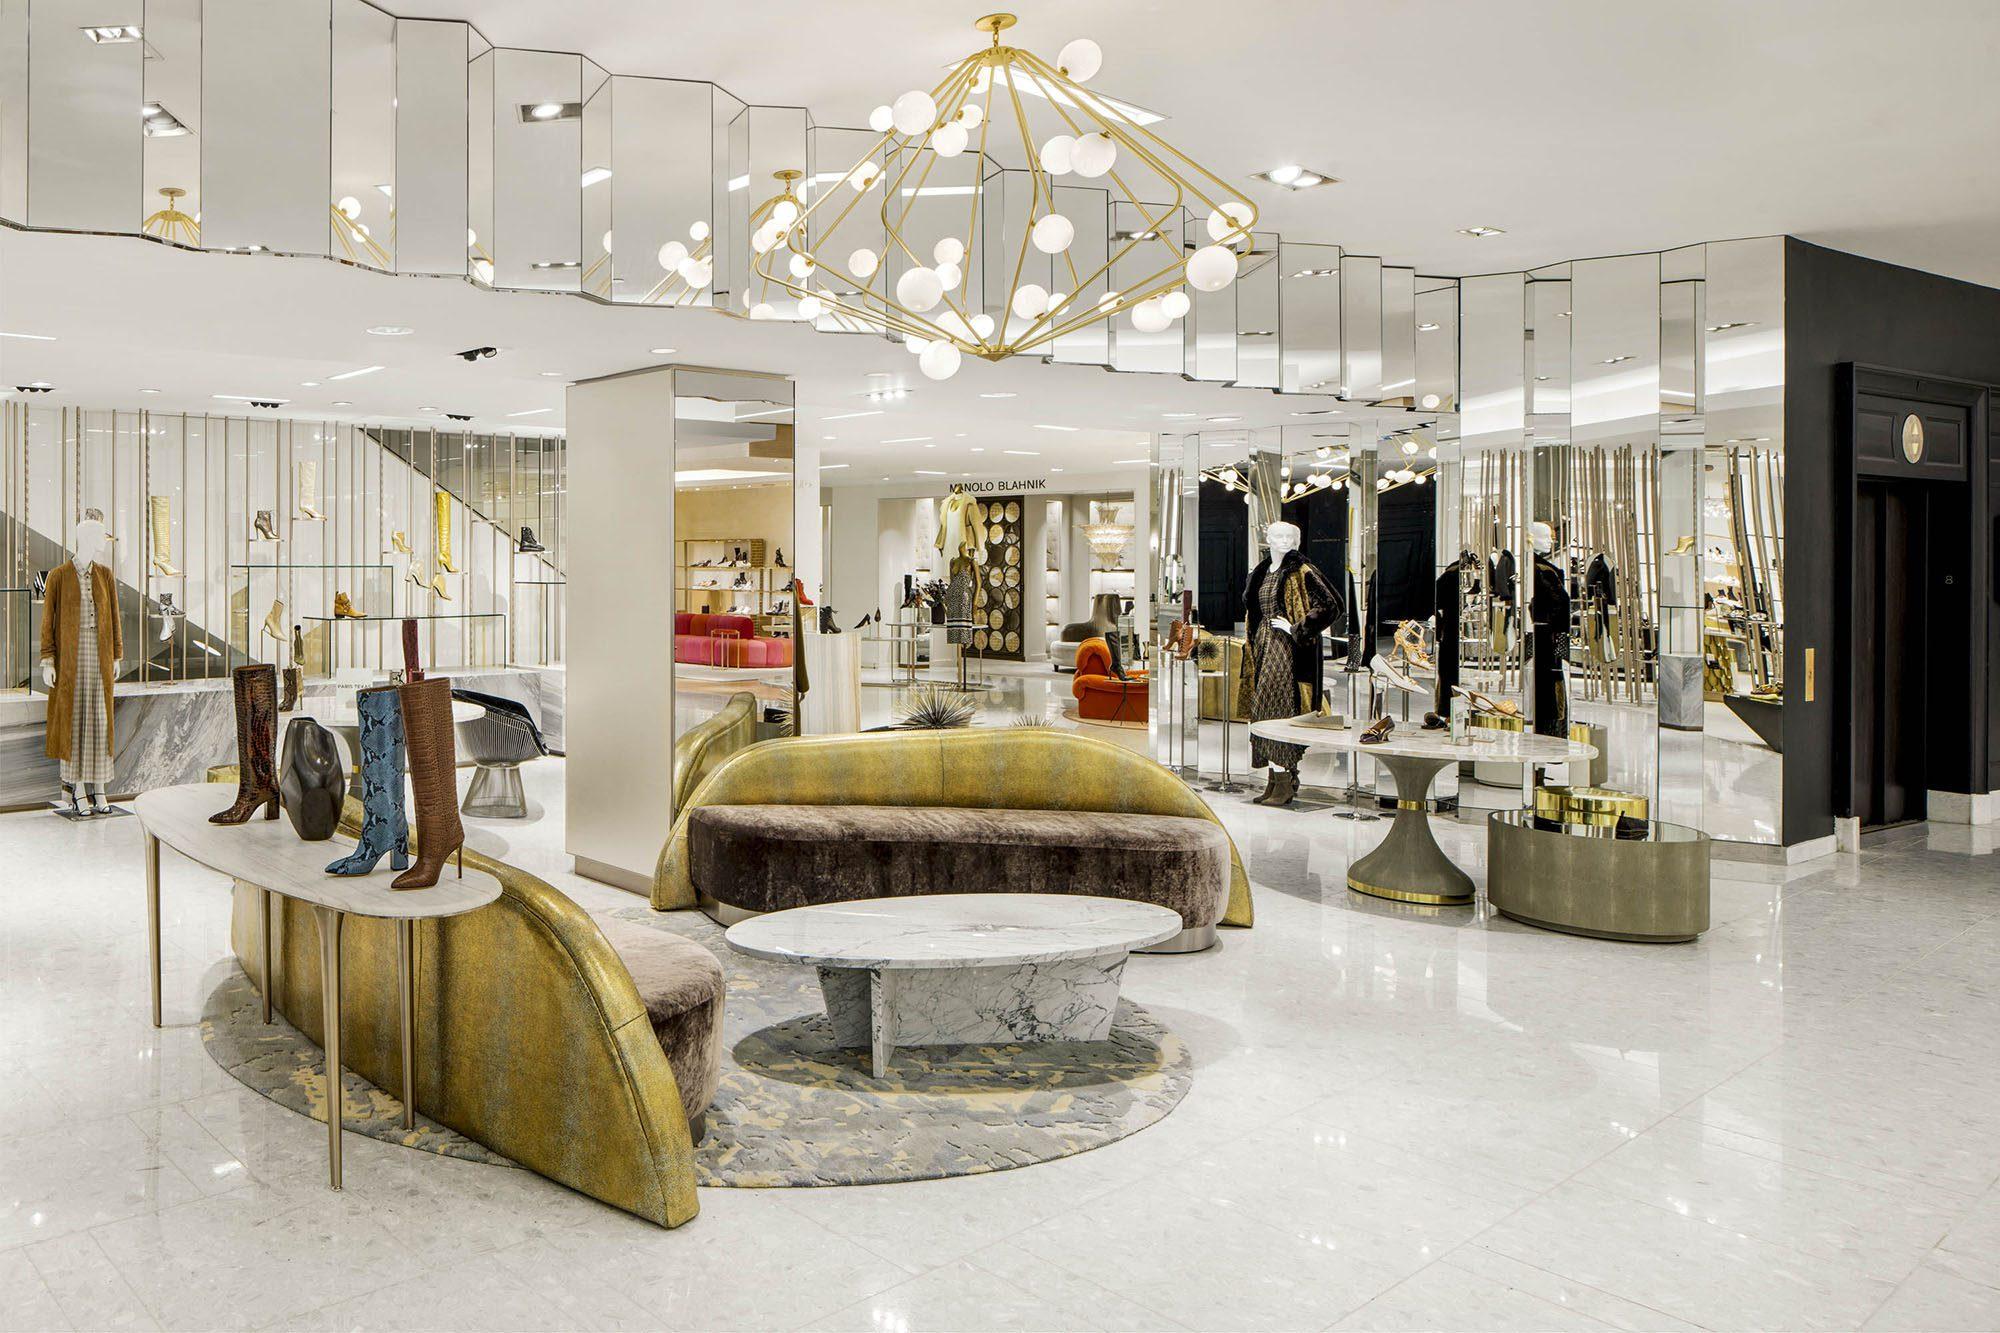 Saks Fifth Avenue, New York City   2019 Design Award Winner